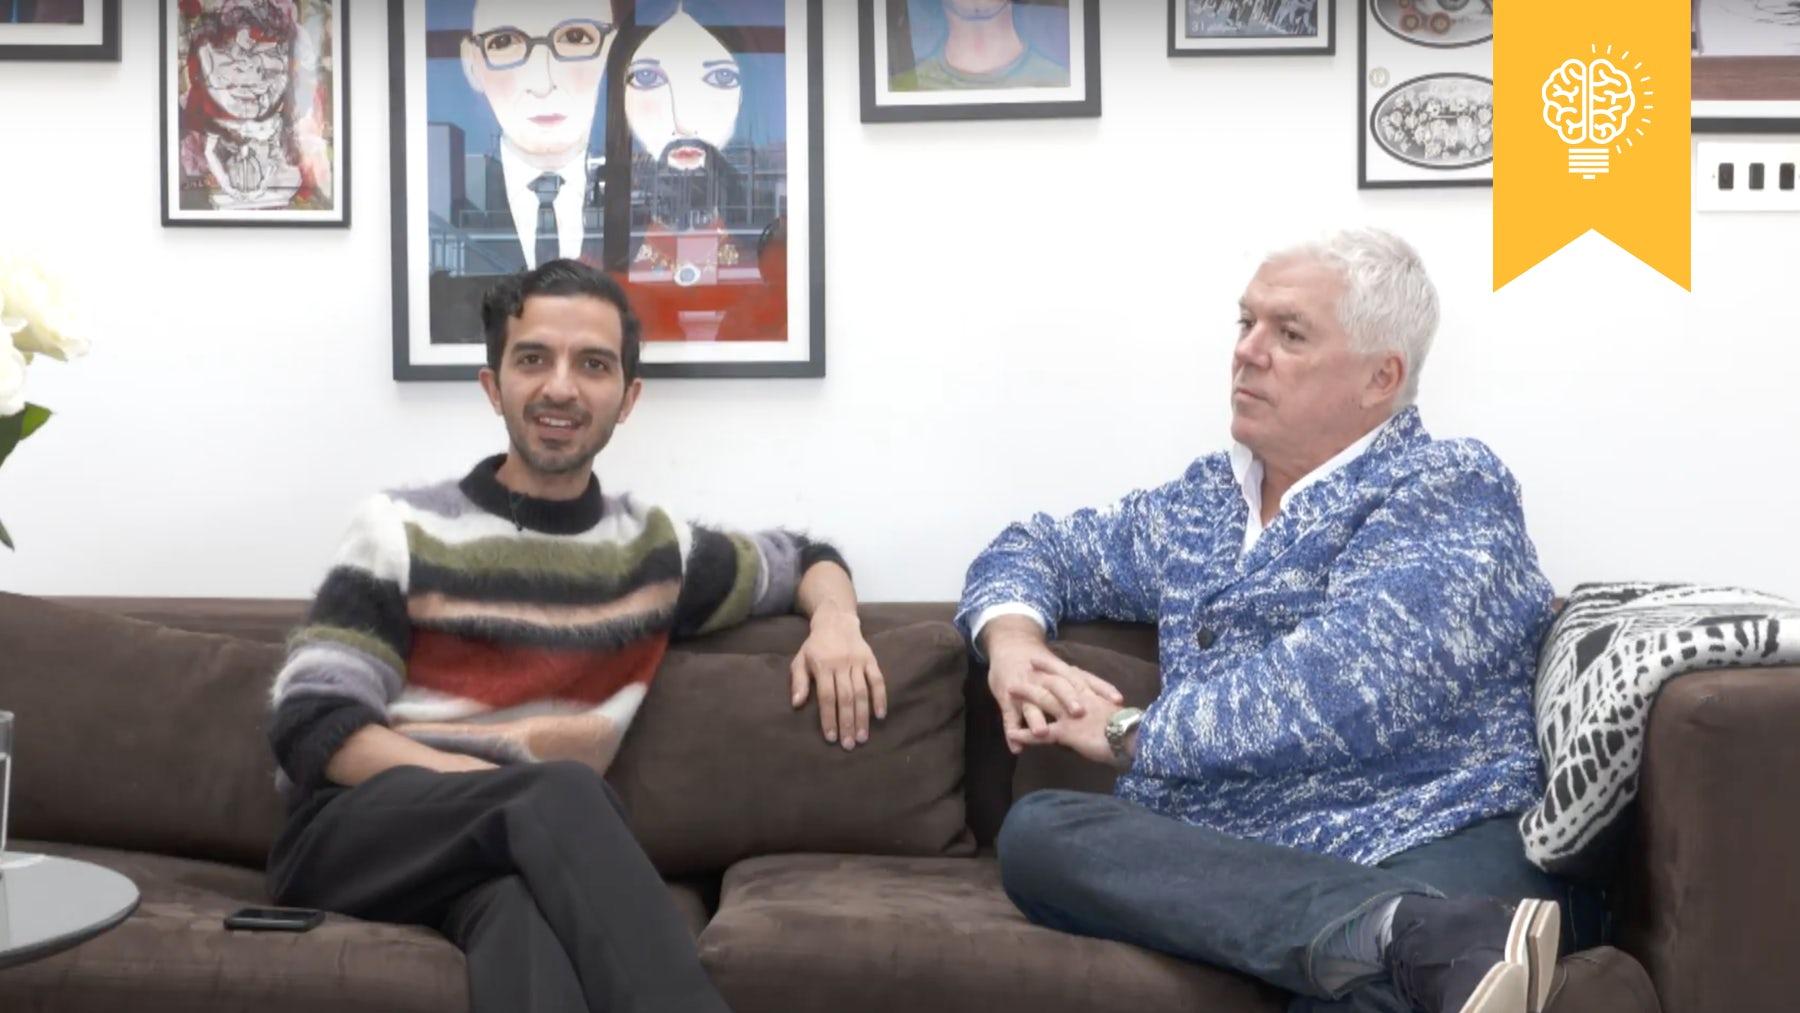 Watch: Tim's Take on S/S 2018